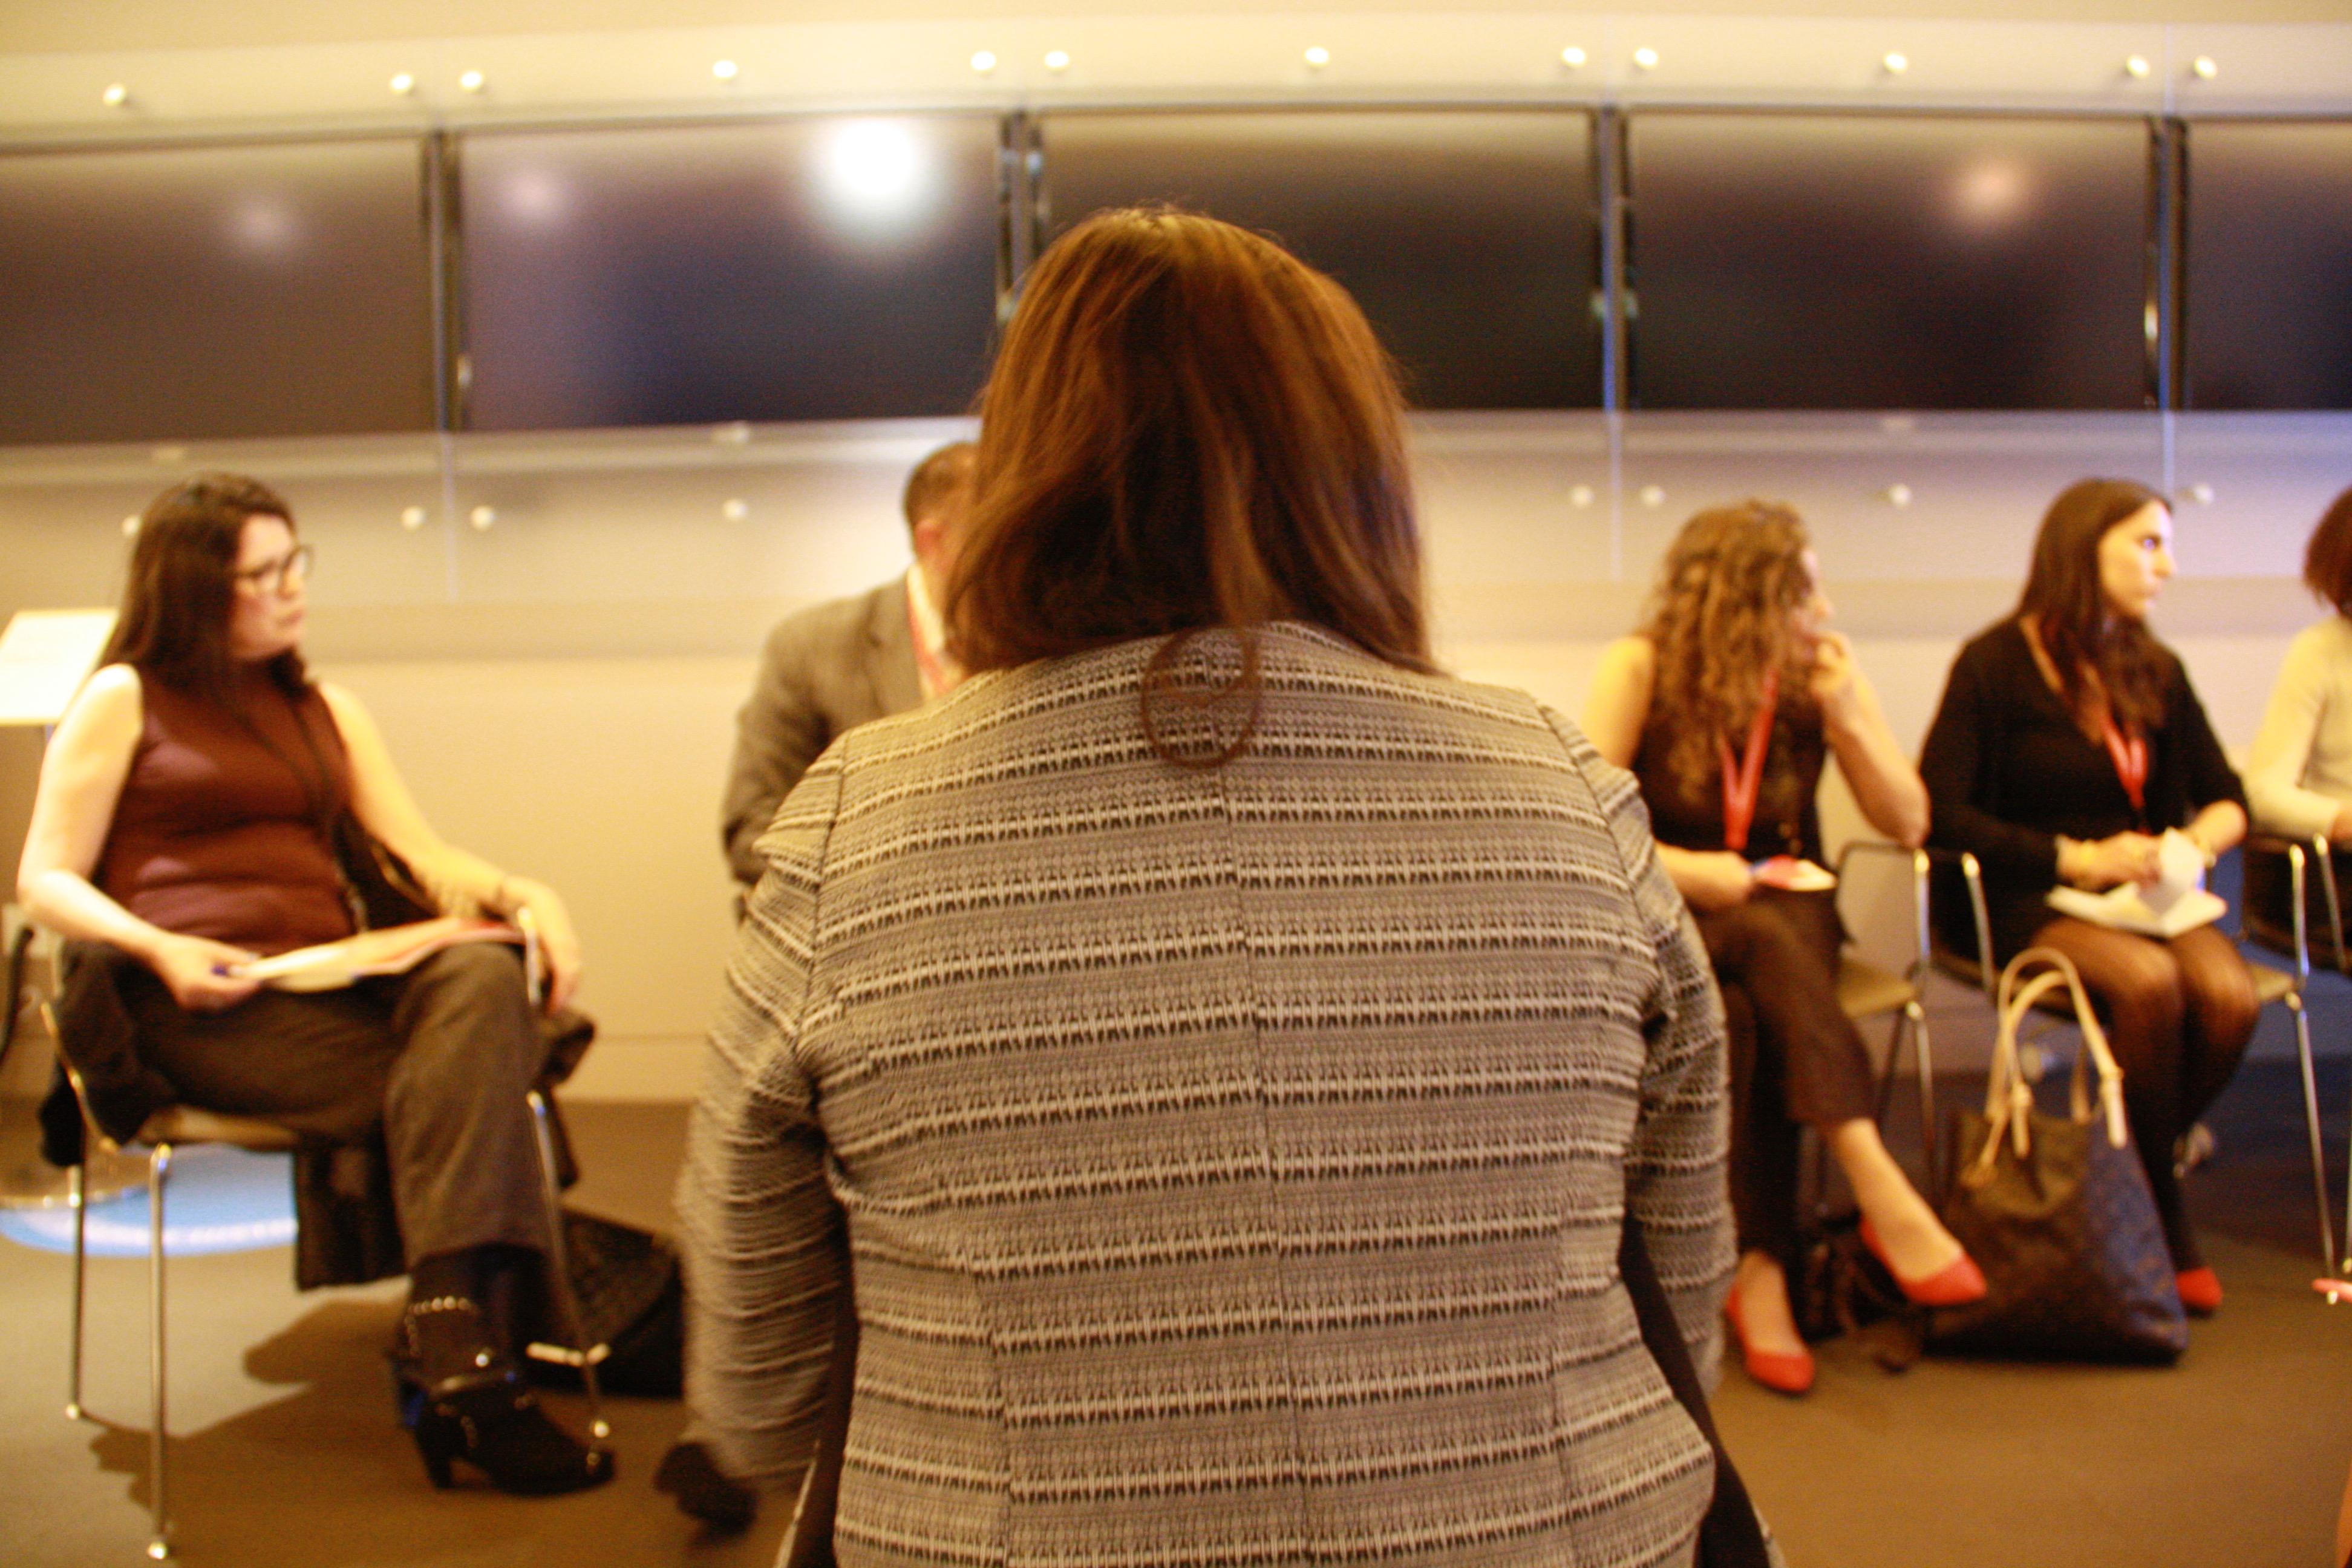 Aprender a ser jefe de tus ex colegas es un punto clave en tu carrera. (Foto tomada en el RSM Signature Event)